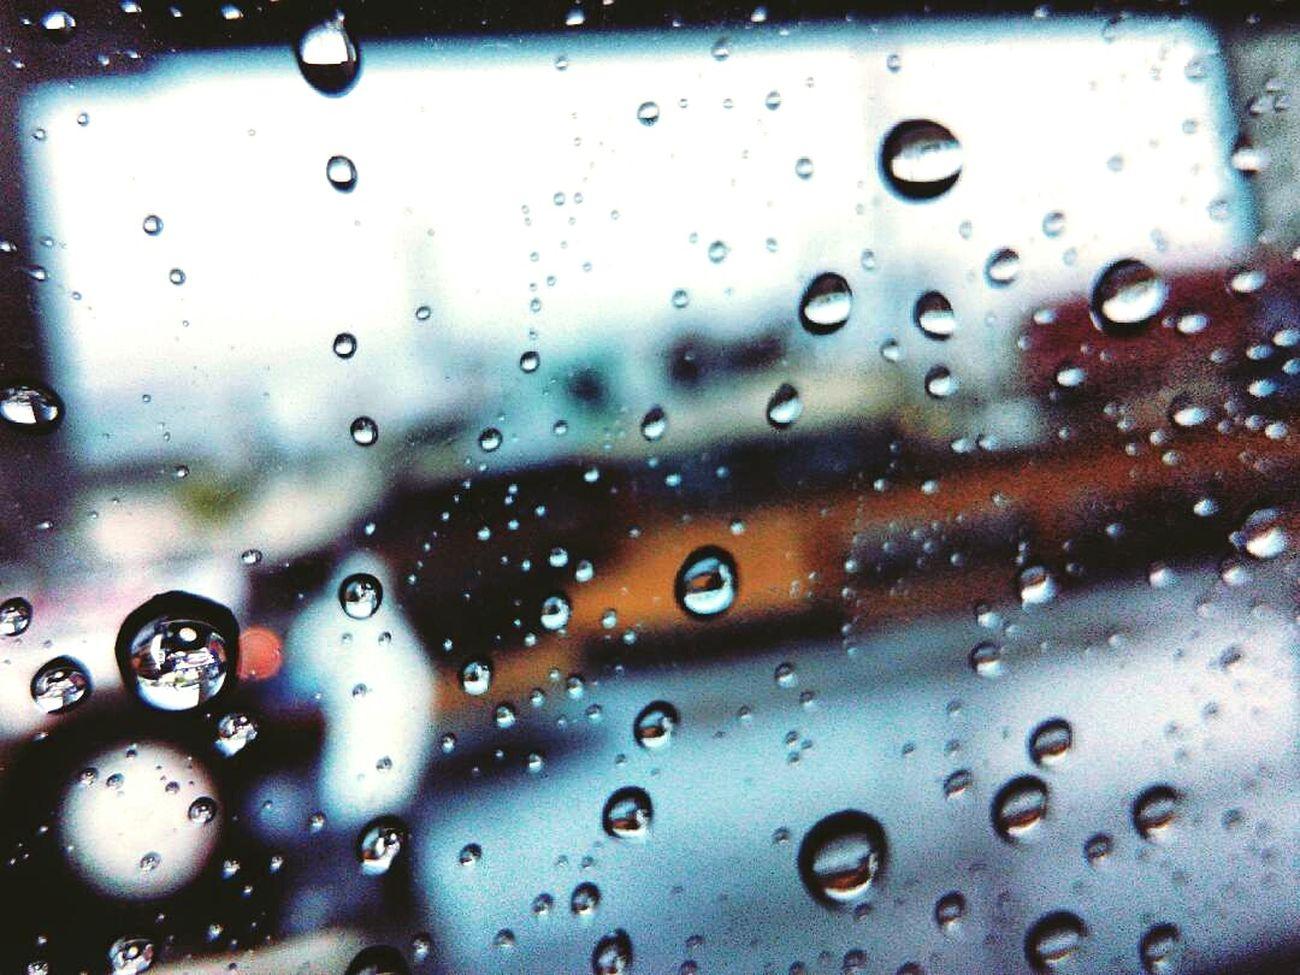 Rainy Days Rain Drops Car Emo Window Drop Rain Transportation Wet No People Weather Water Vehicle Interior Close-up Rainy Season Day RainDrop Indoors  Nature Sky